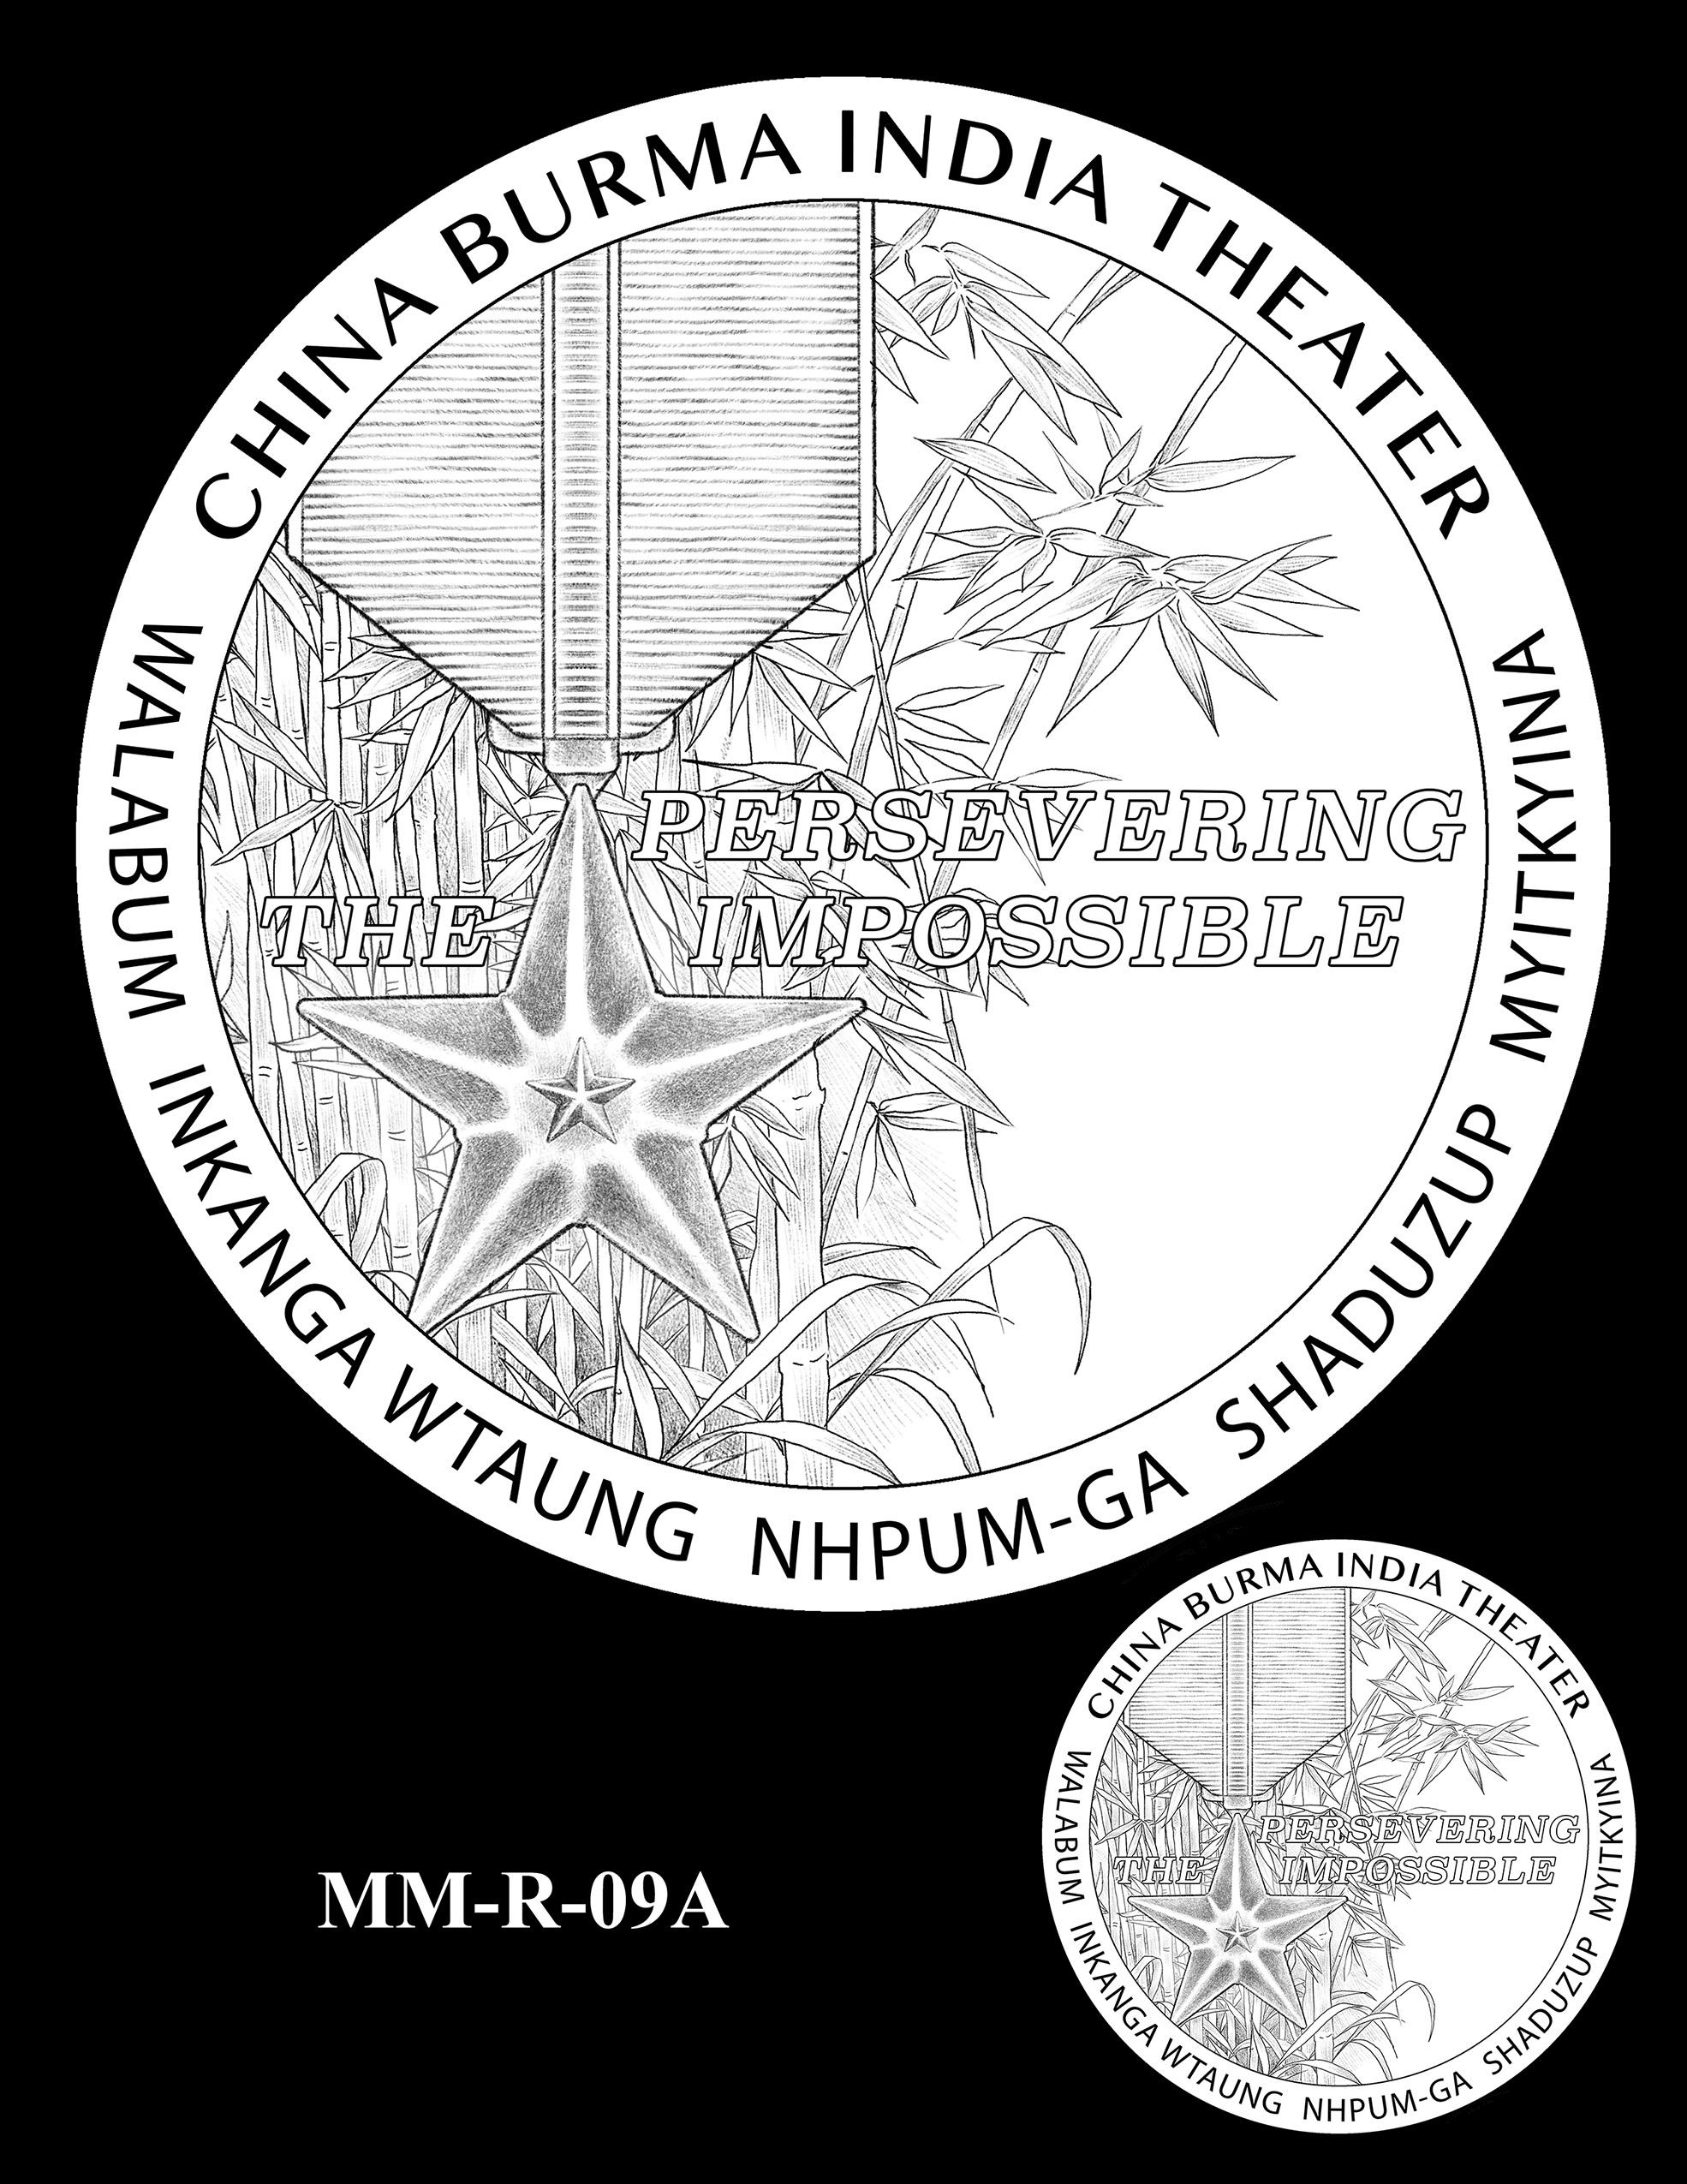 MM-R-09A -- Merrill's Marauders Congressional Gold Medal